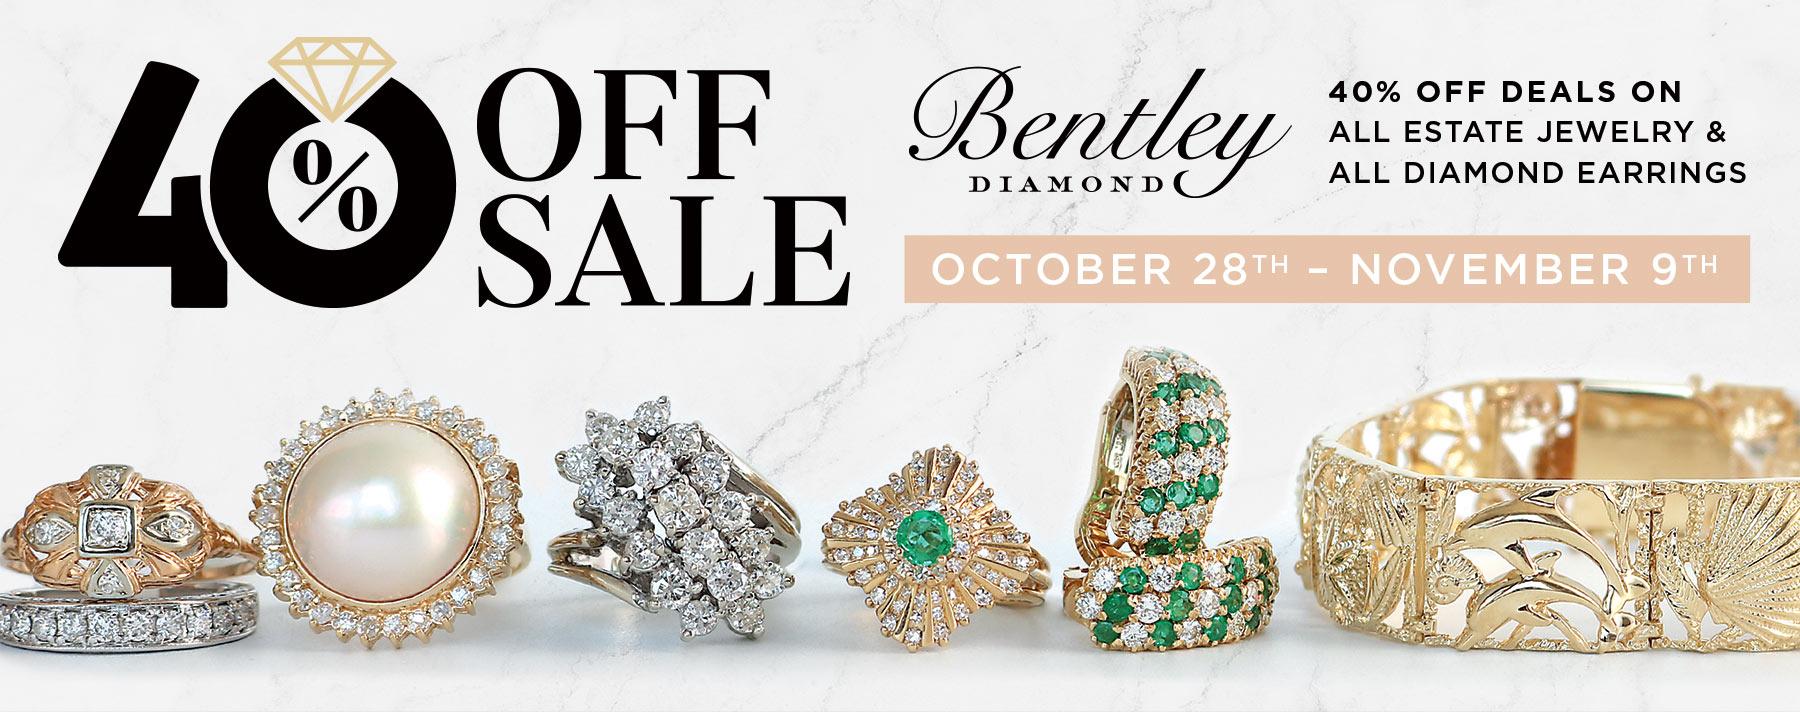 Bentley Diamond- 40% OFF Sale